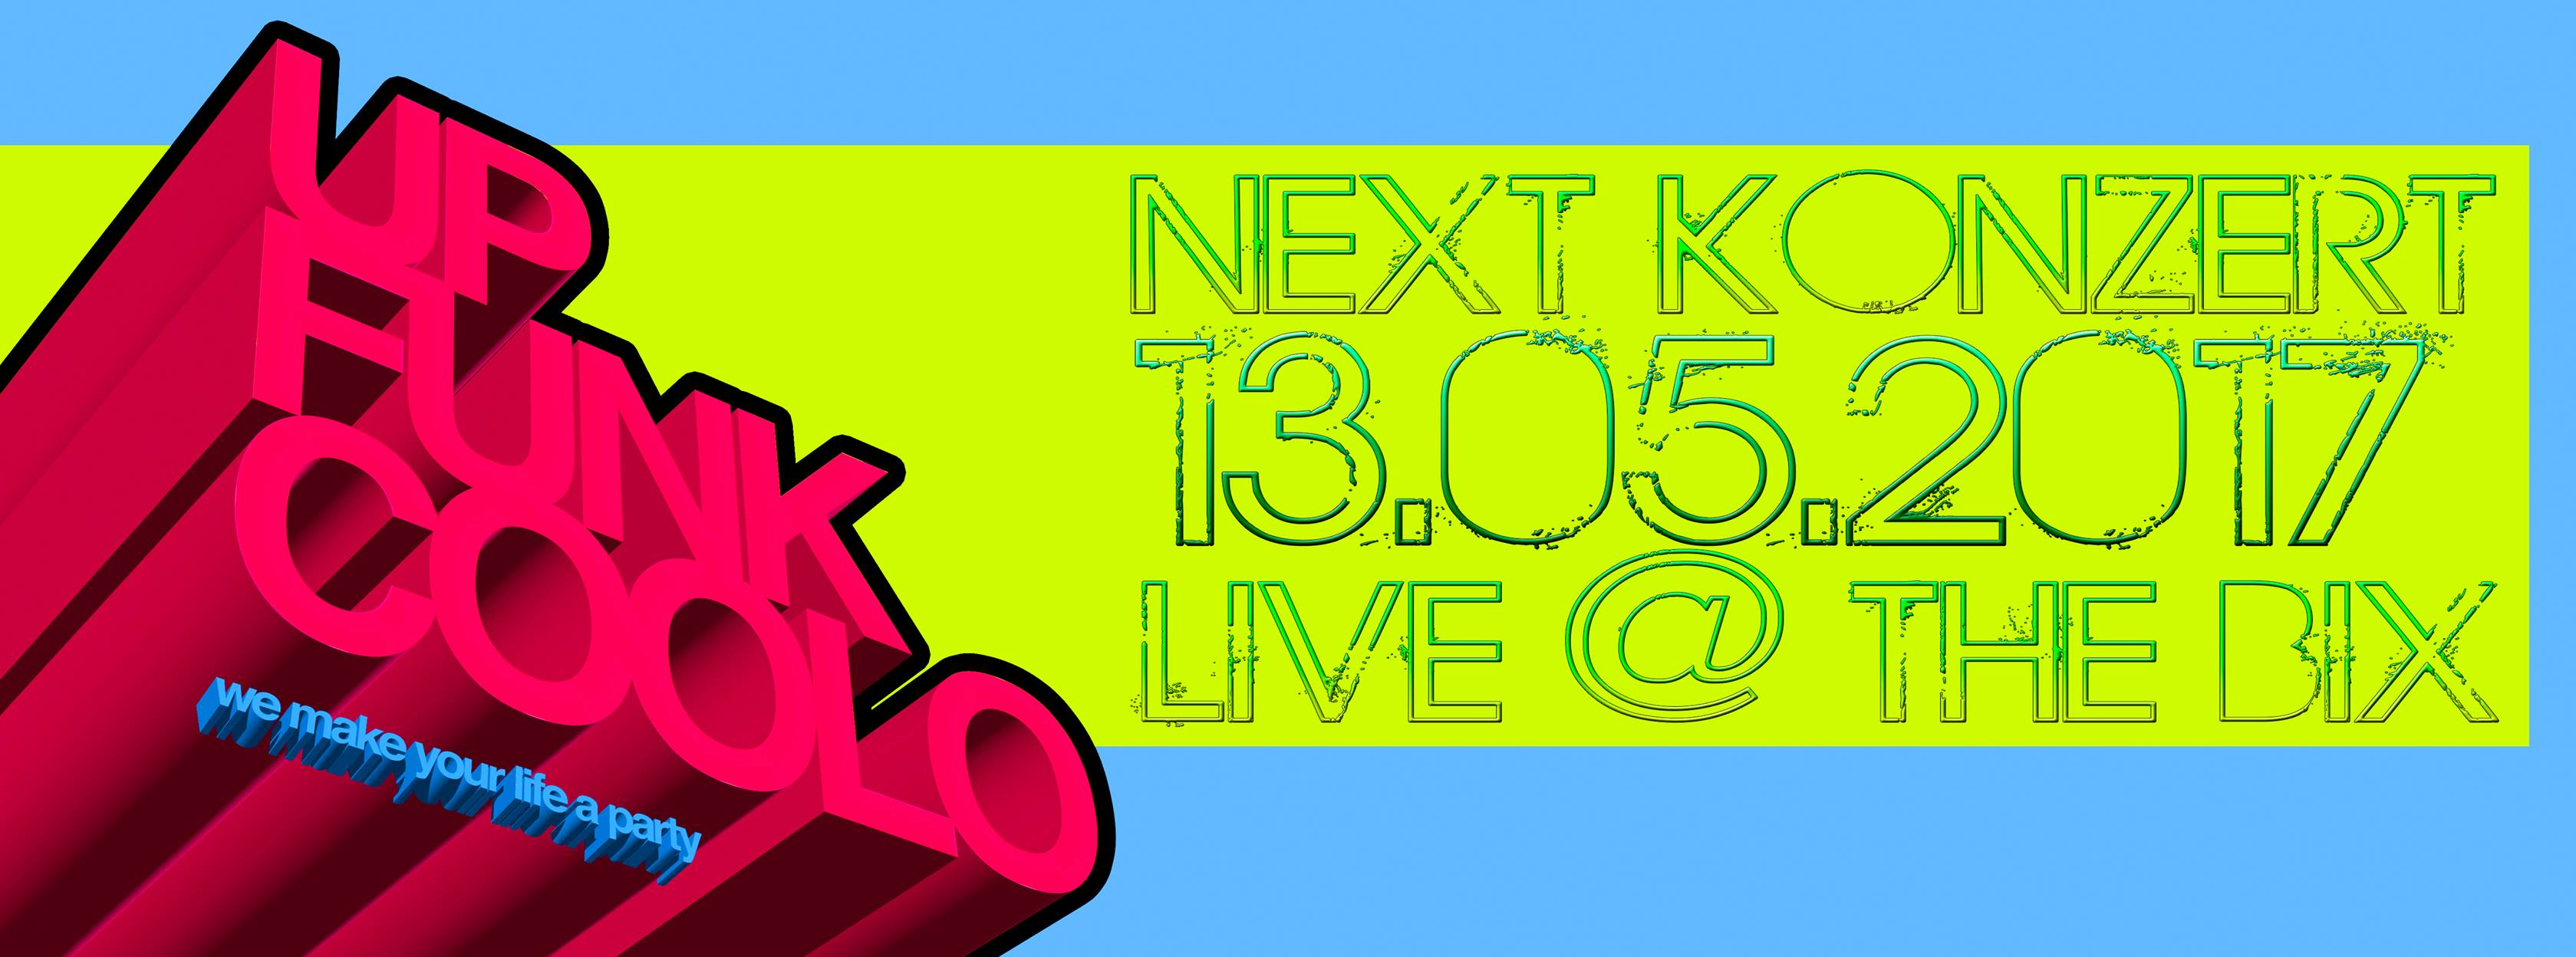 Veranstaltungstipp: Upfunkcoolo LIVE @ The BIX